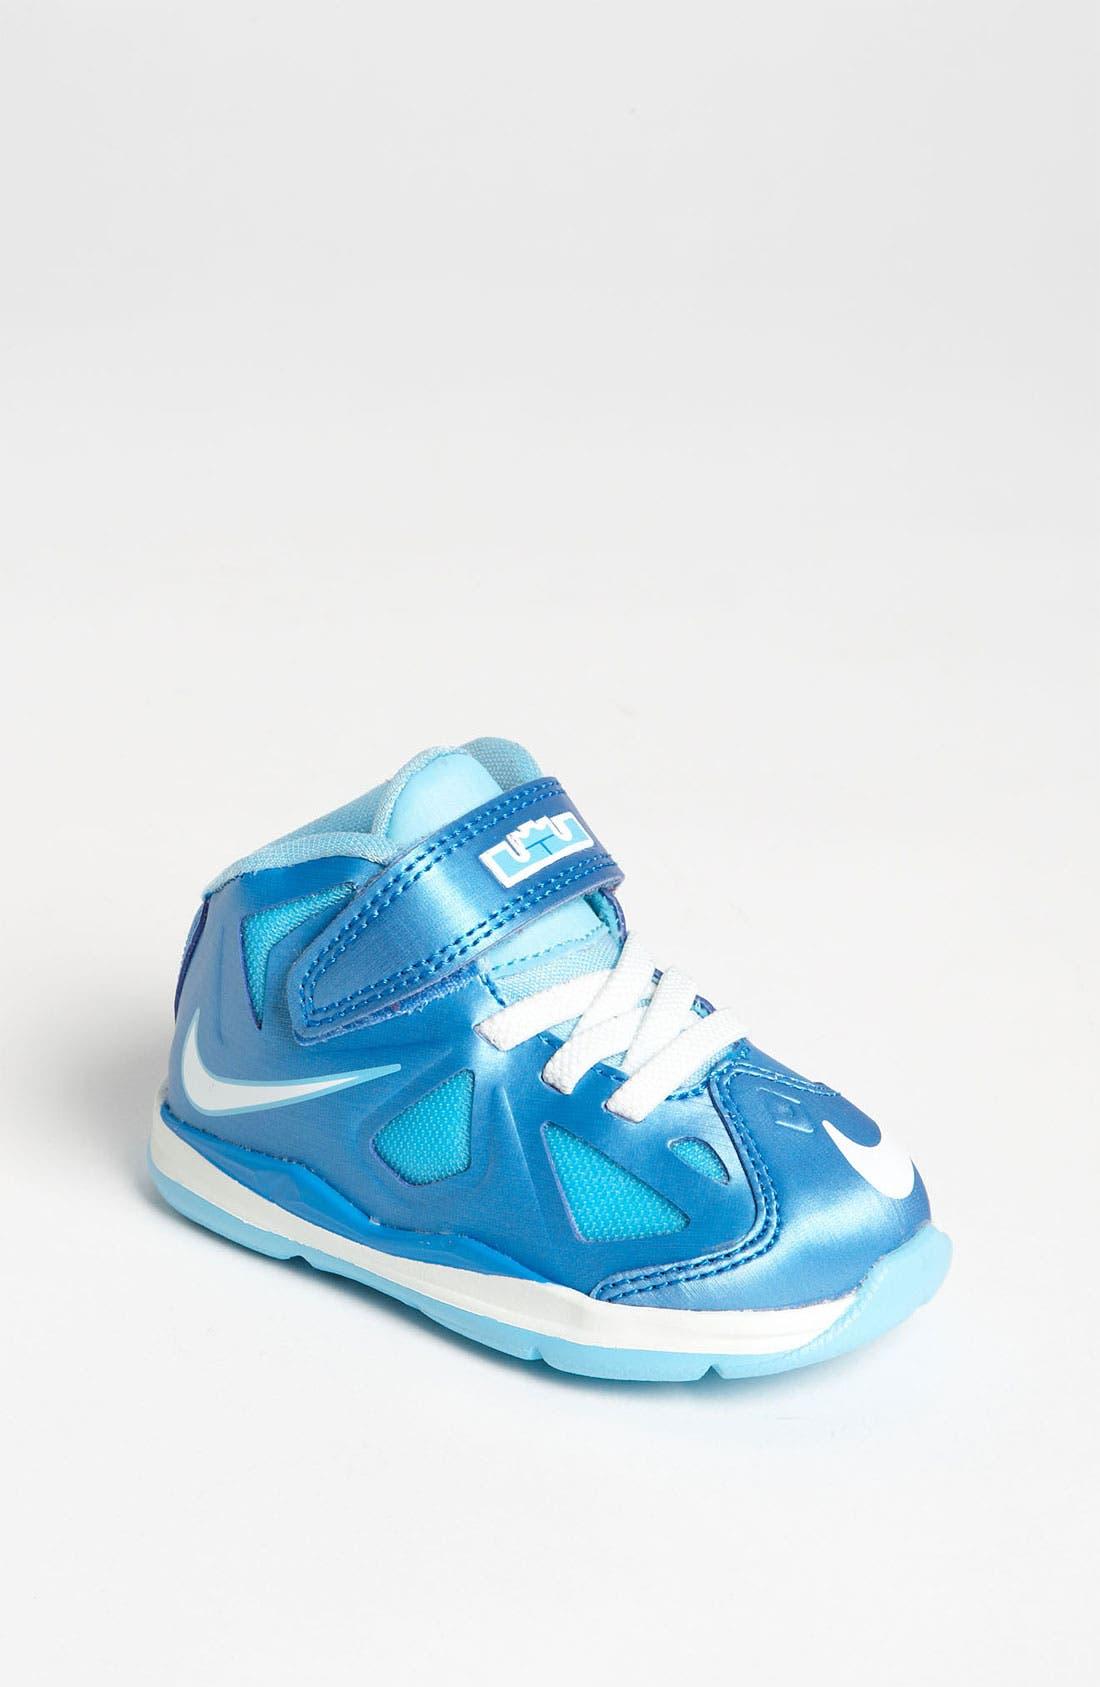 Alternate Image 1 Selected - Nike 'LeBron 10' Basketball Shoe (Baby, Walker & Toddler)